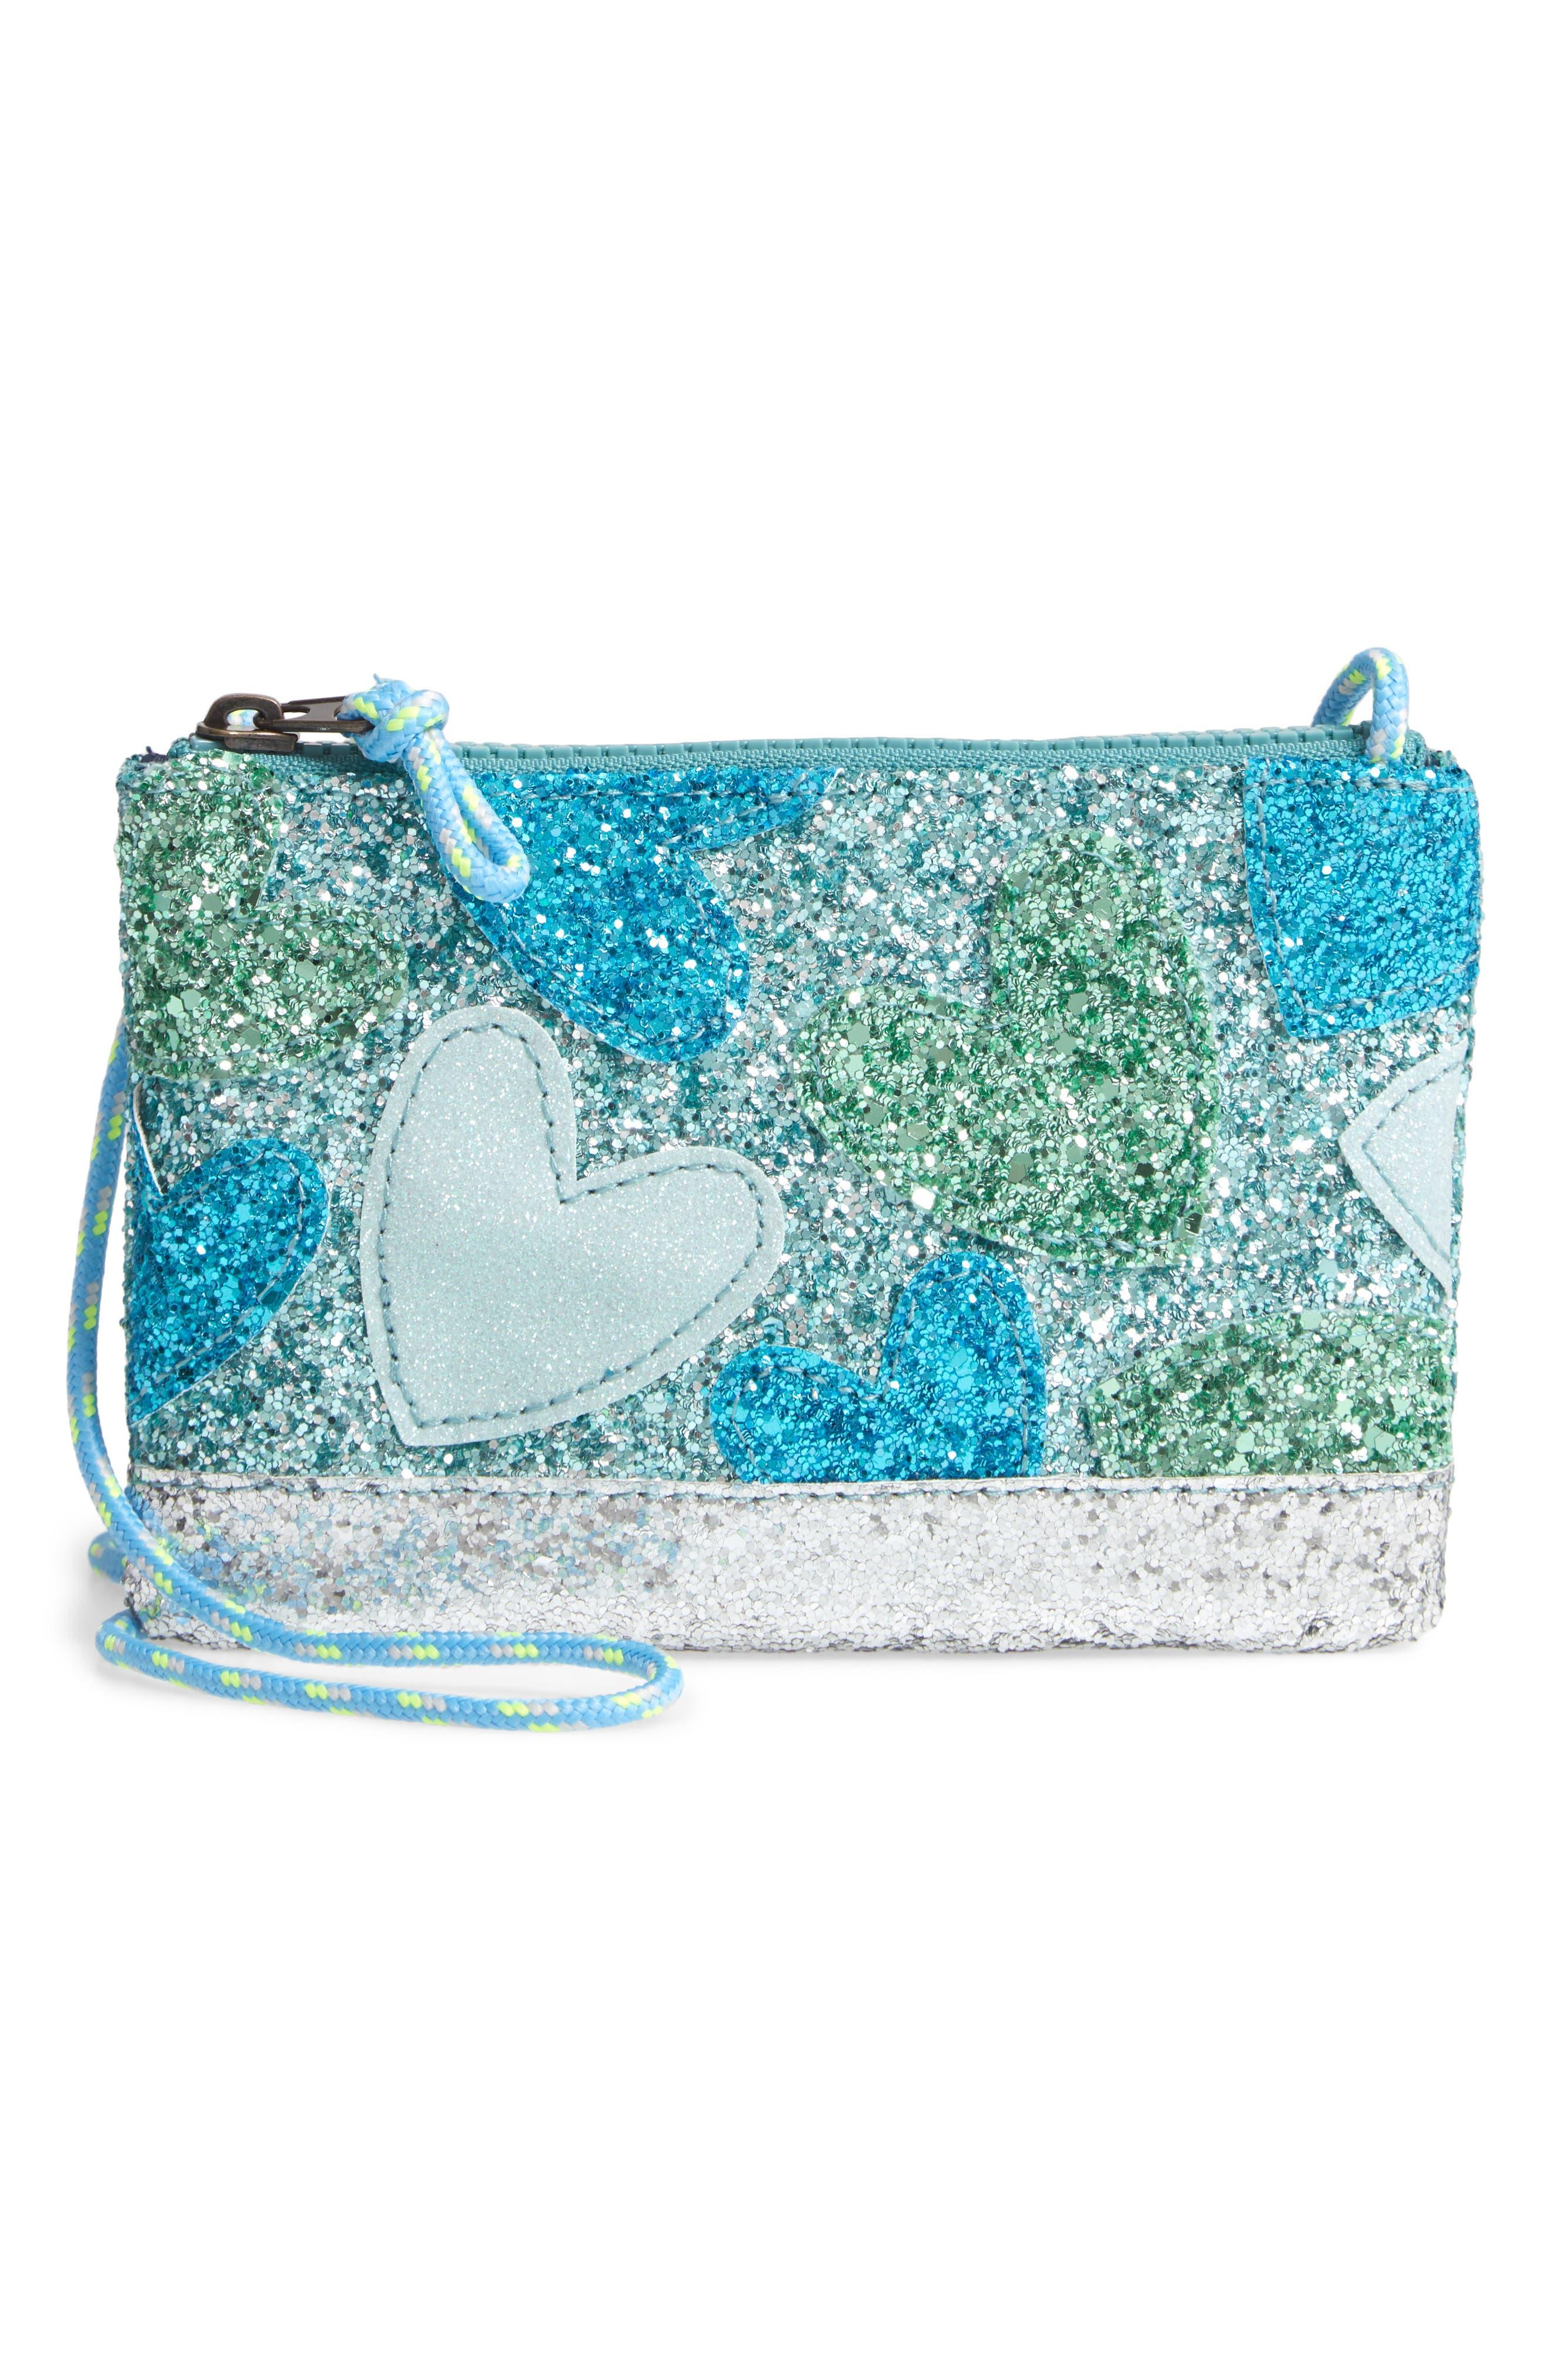 Girls Crewcuts By Jcrew Glitter Heart Crossbody Pouchette Bag